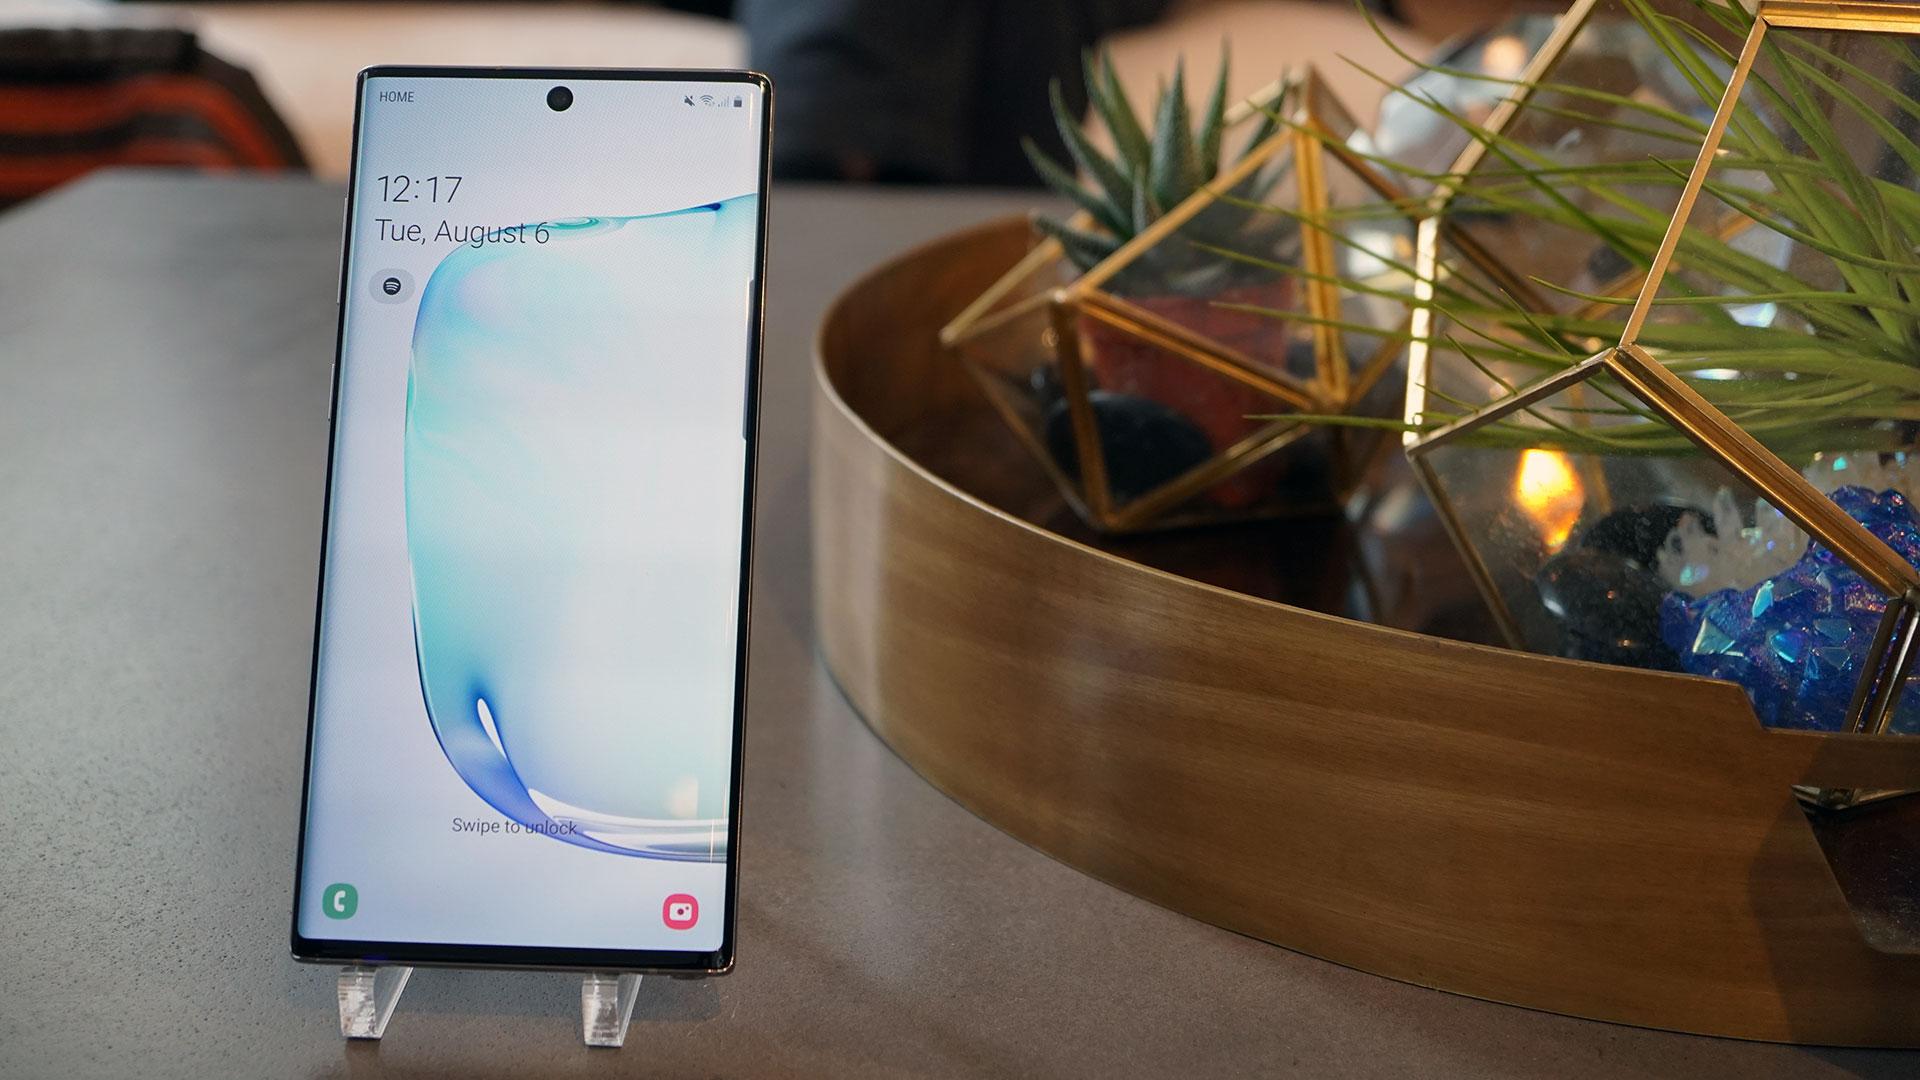 Laporan dari New York: Samsung Galaxy Note 10 dan Note 10+, Apa Bedanya?